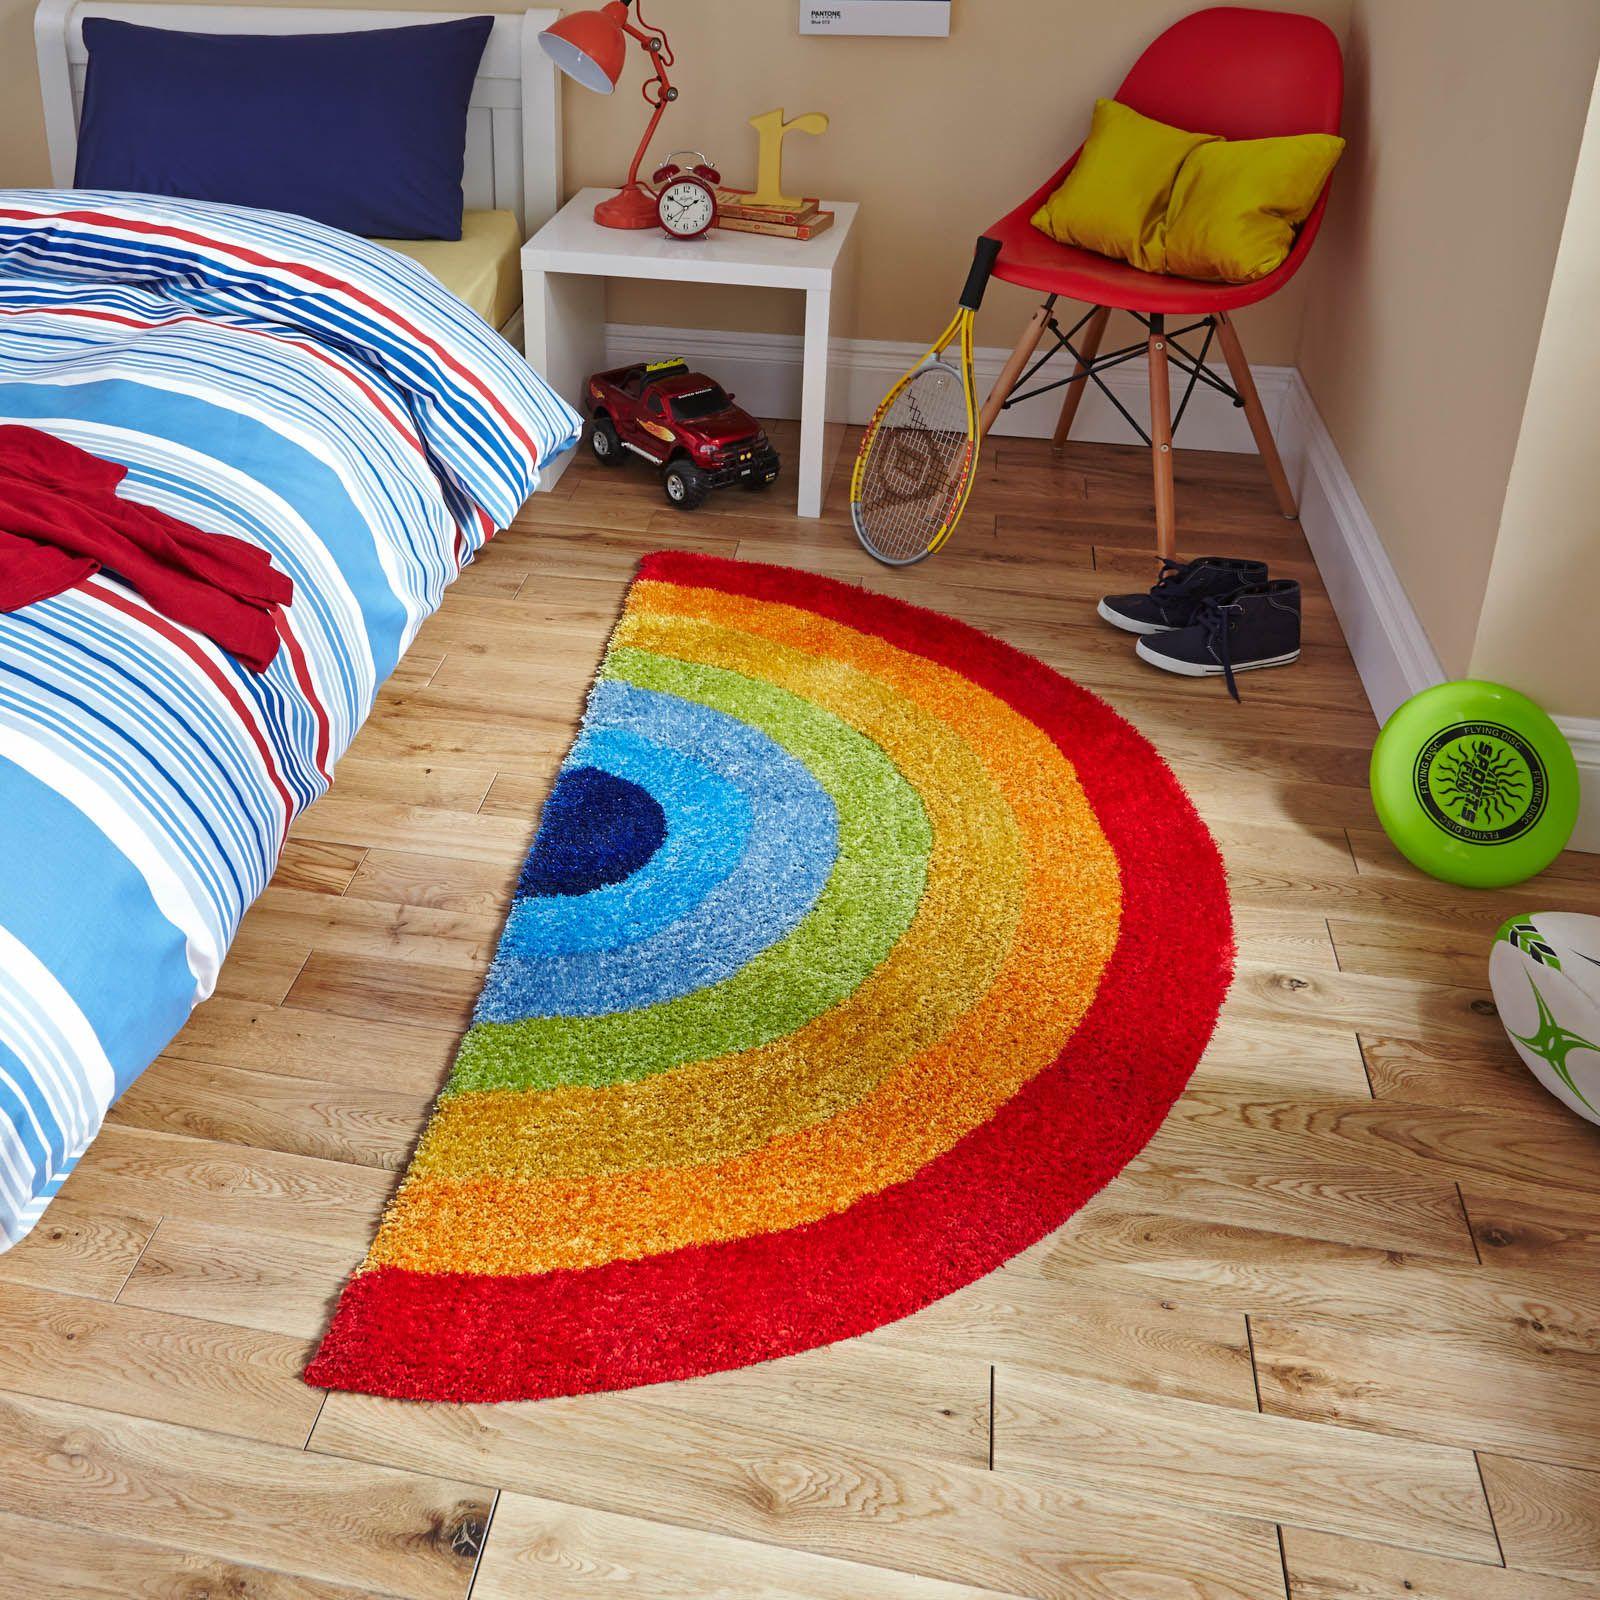 Hopscotch Rugs Football Brink Kids Capri Wonderland Delightful Bedroom Area Pink Rug With